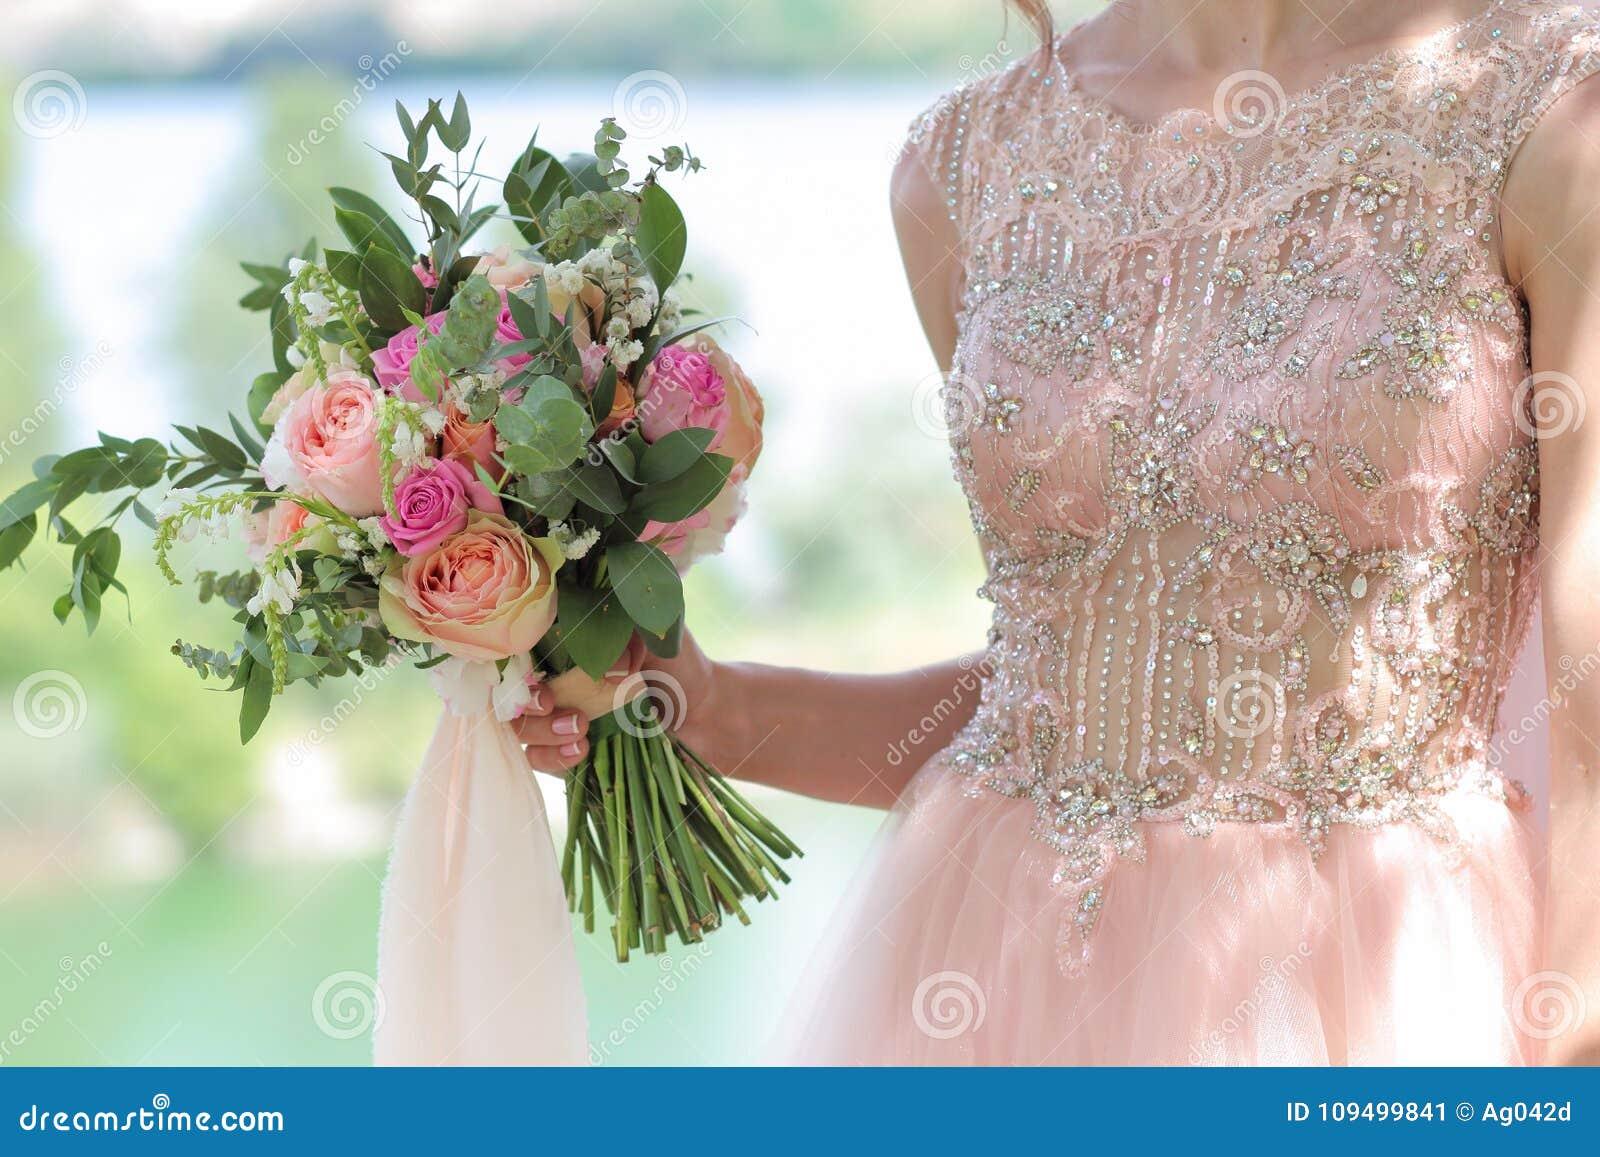 Beautiful bridal bouquet in hands of the bride wedding bouquet of beautiful bridal bouquet in hands of the bride wedding bouquet of peach roses by david austin single head pink rose aqua eucalyptus ruscus gypsophila izmirmasajfo